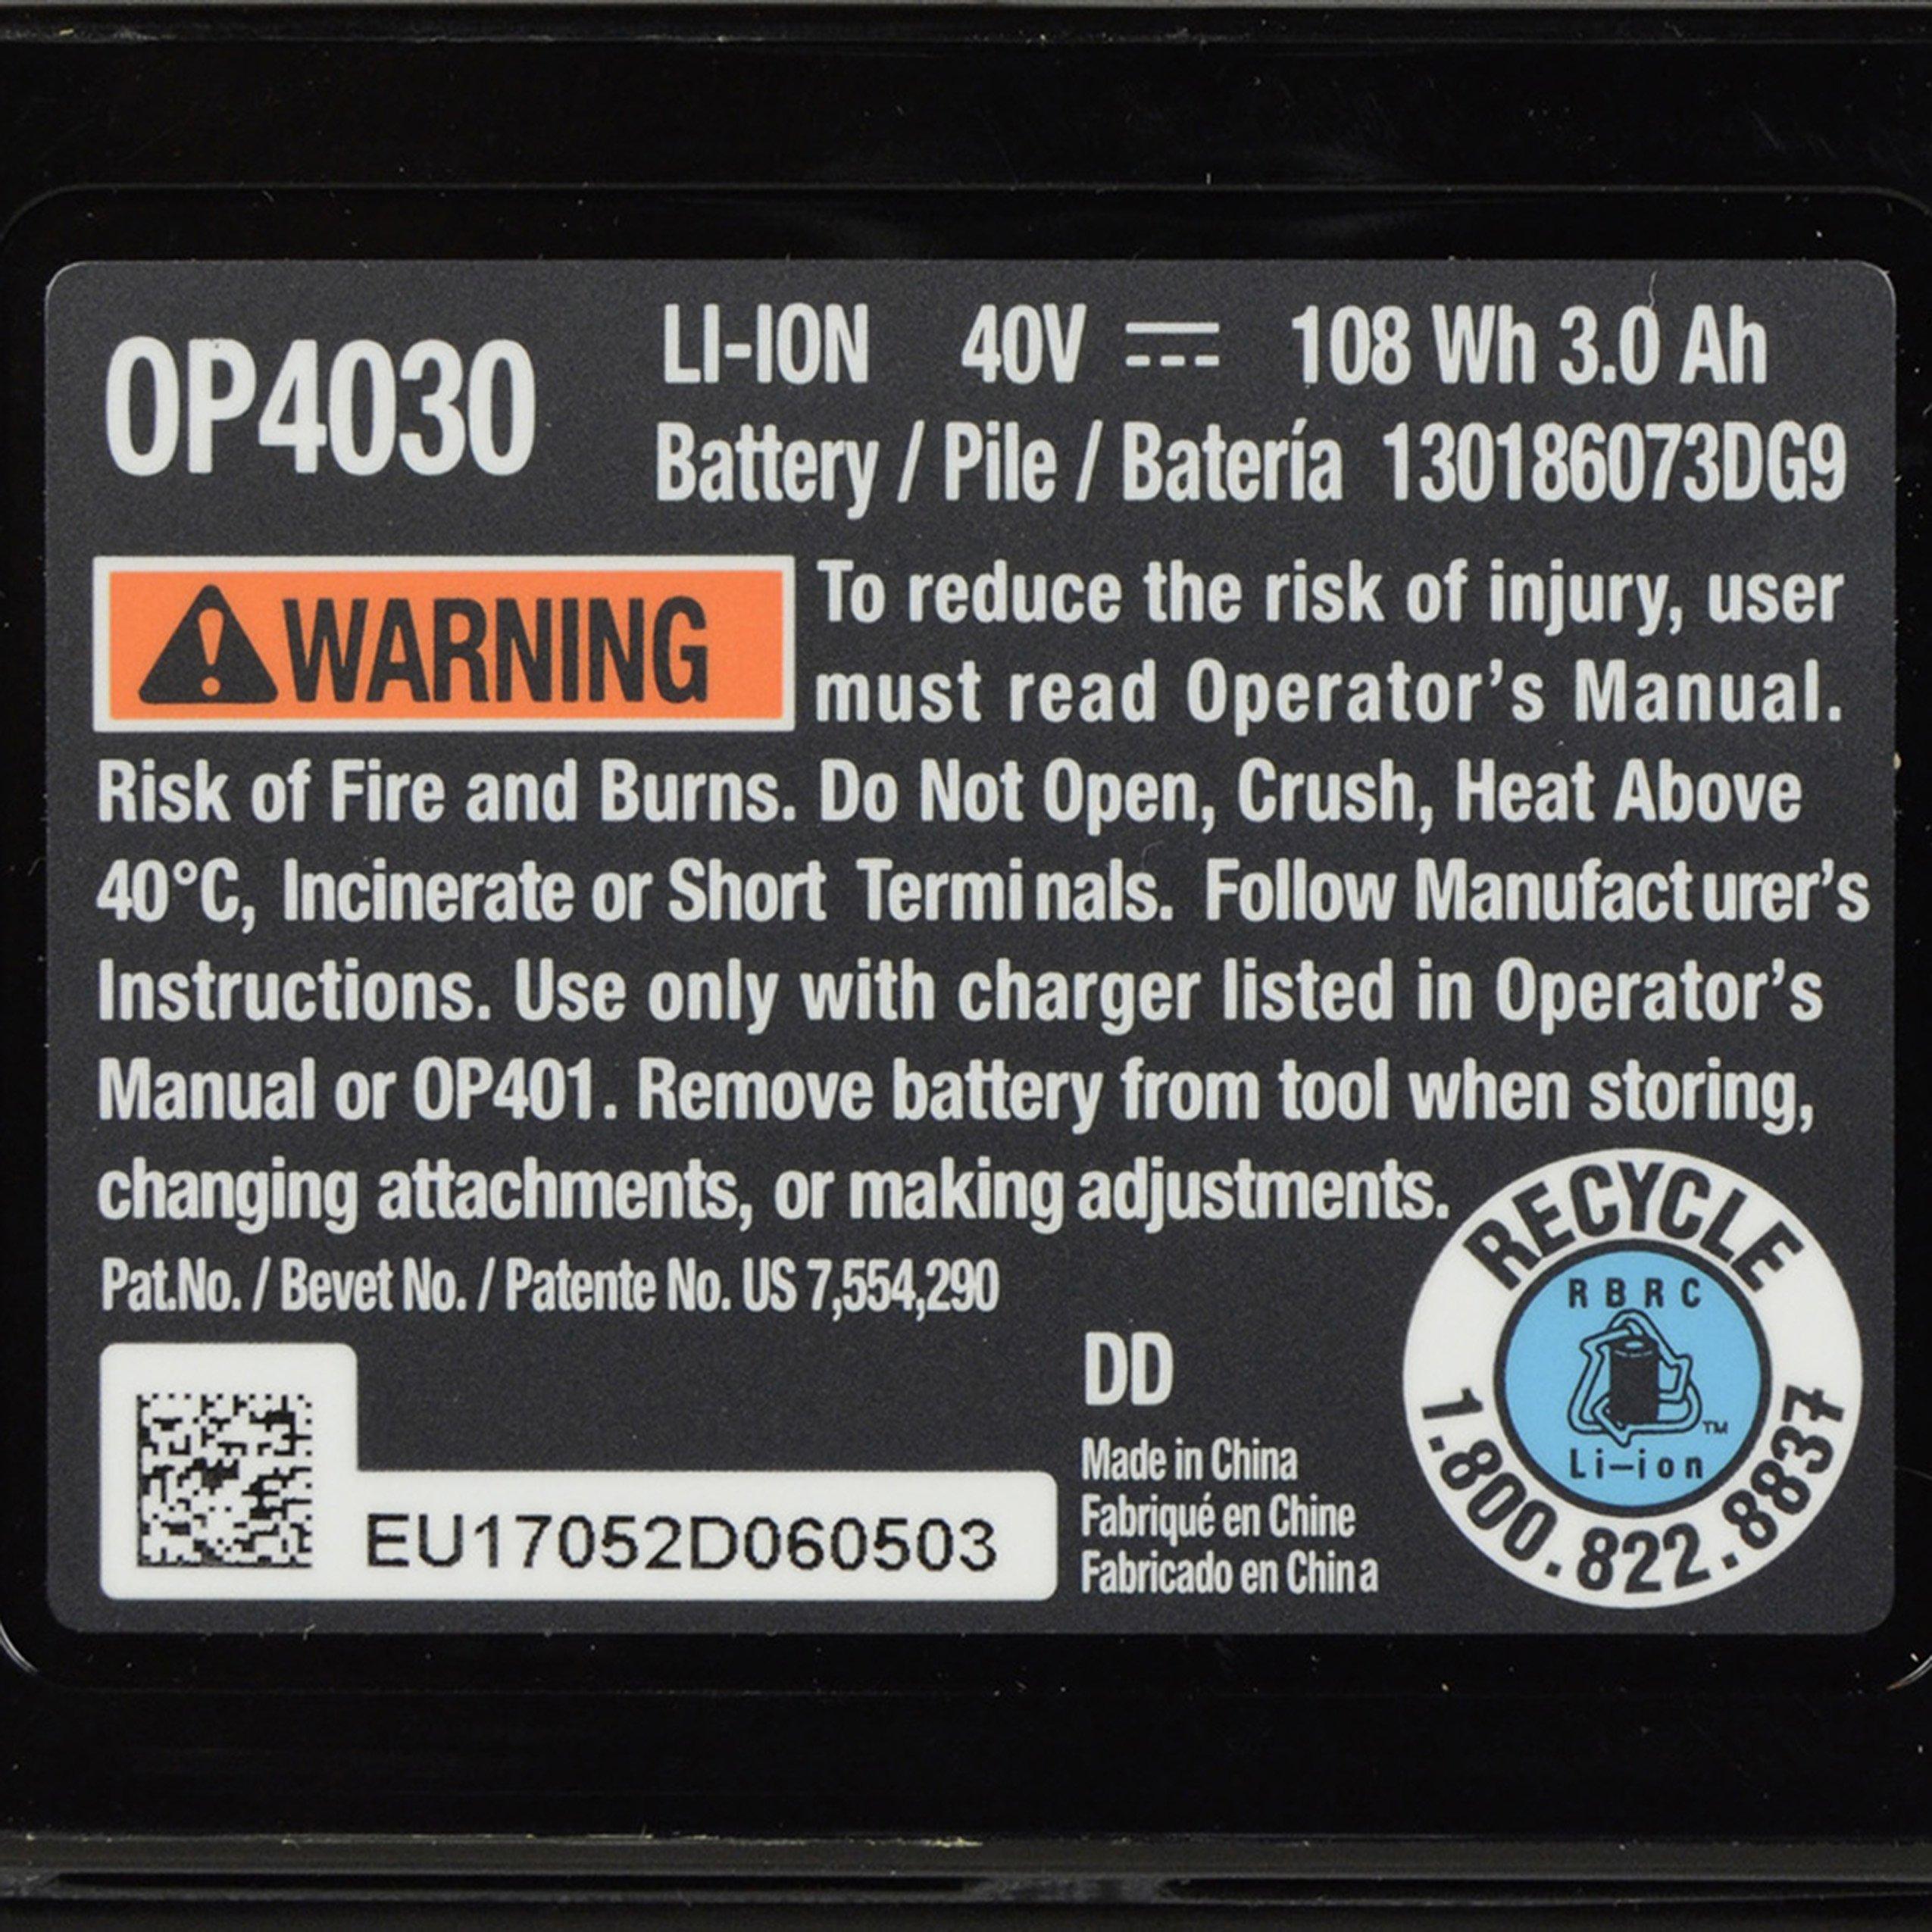 Ryobi OP4030 40V 3.0Ah Lithium ion Battery w/ Fuel Gauge by Ryobi (Image #5)